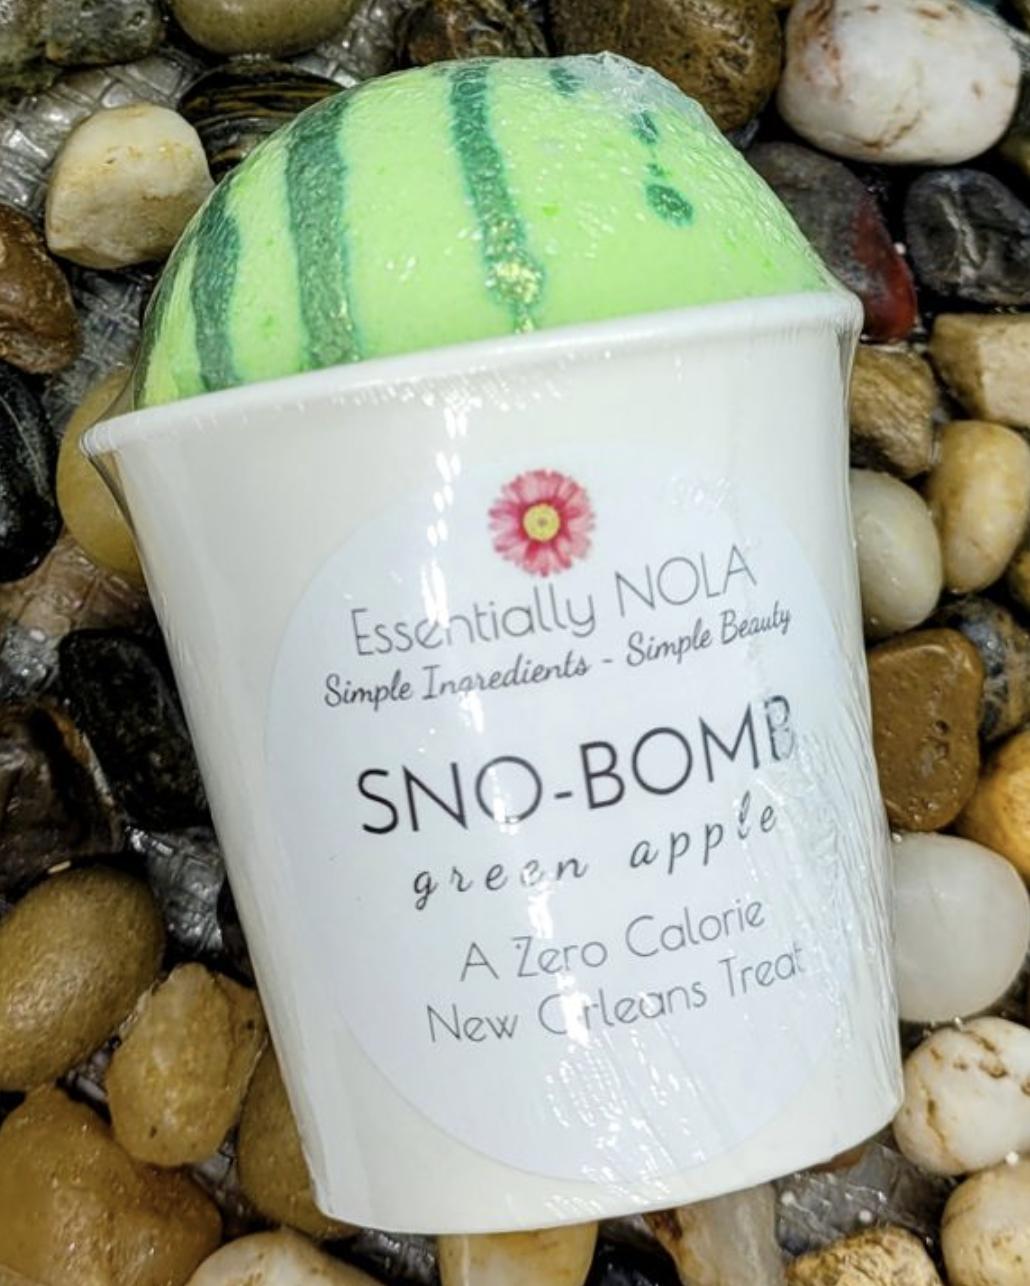 Bath Bomb - Green Apple Snow-Bombs